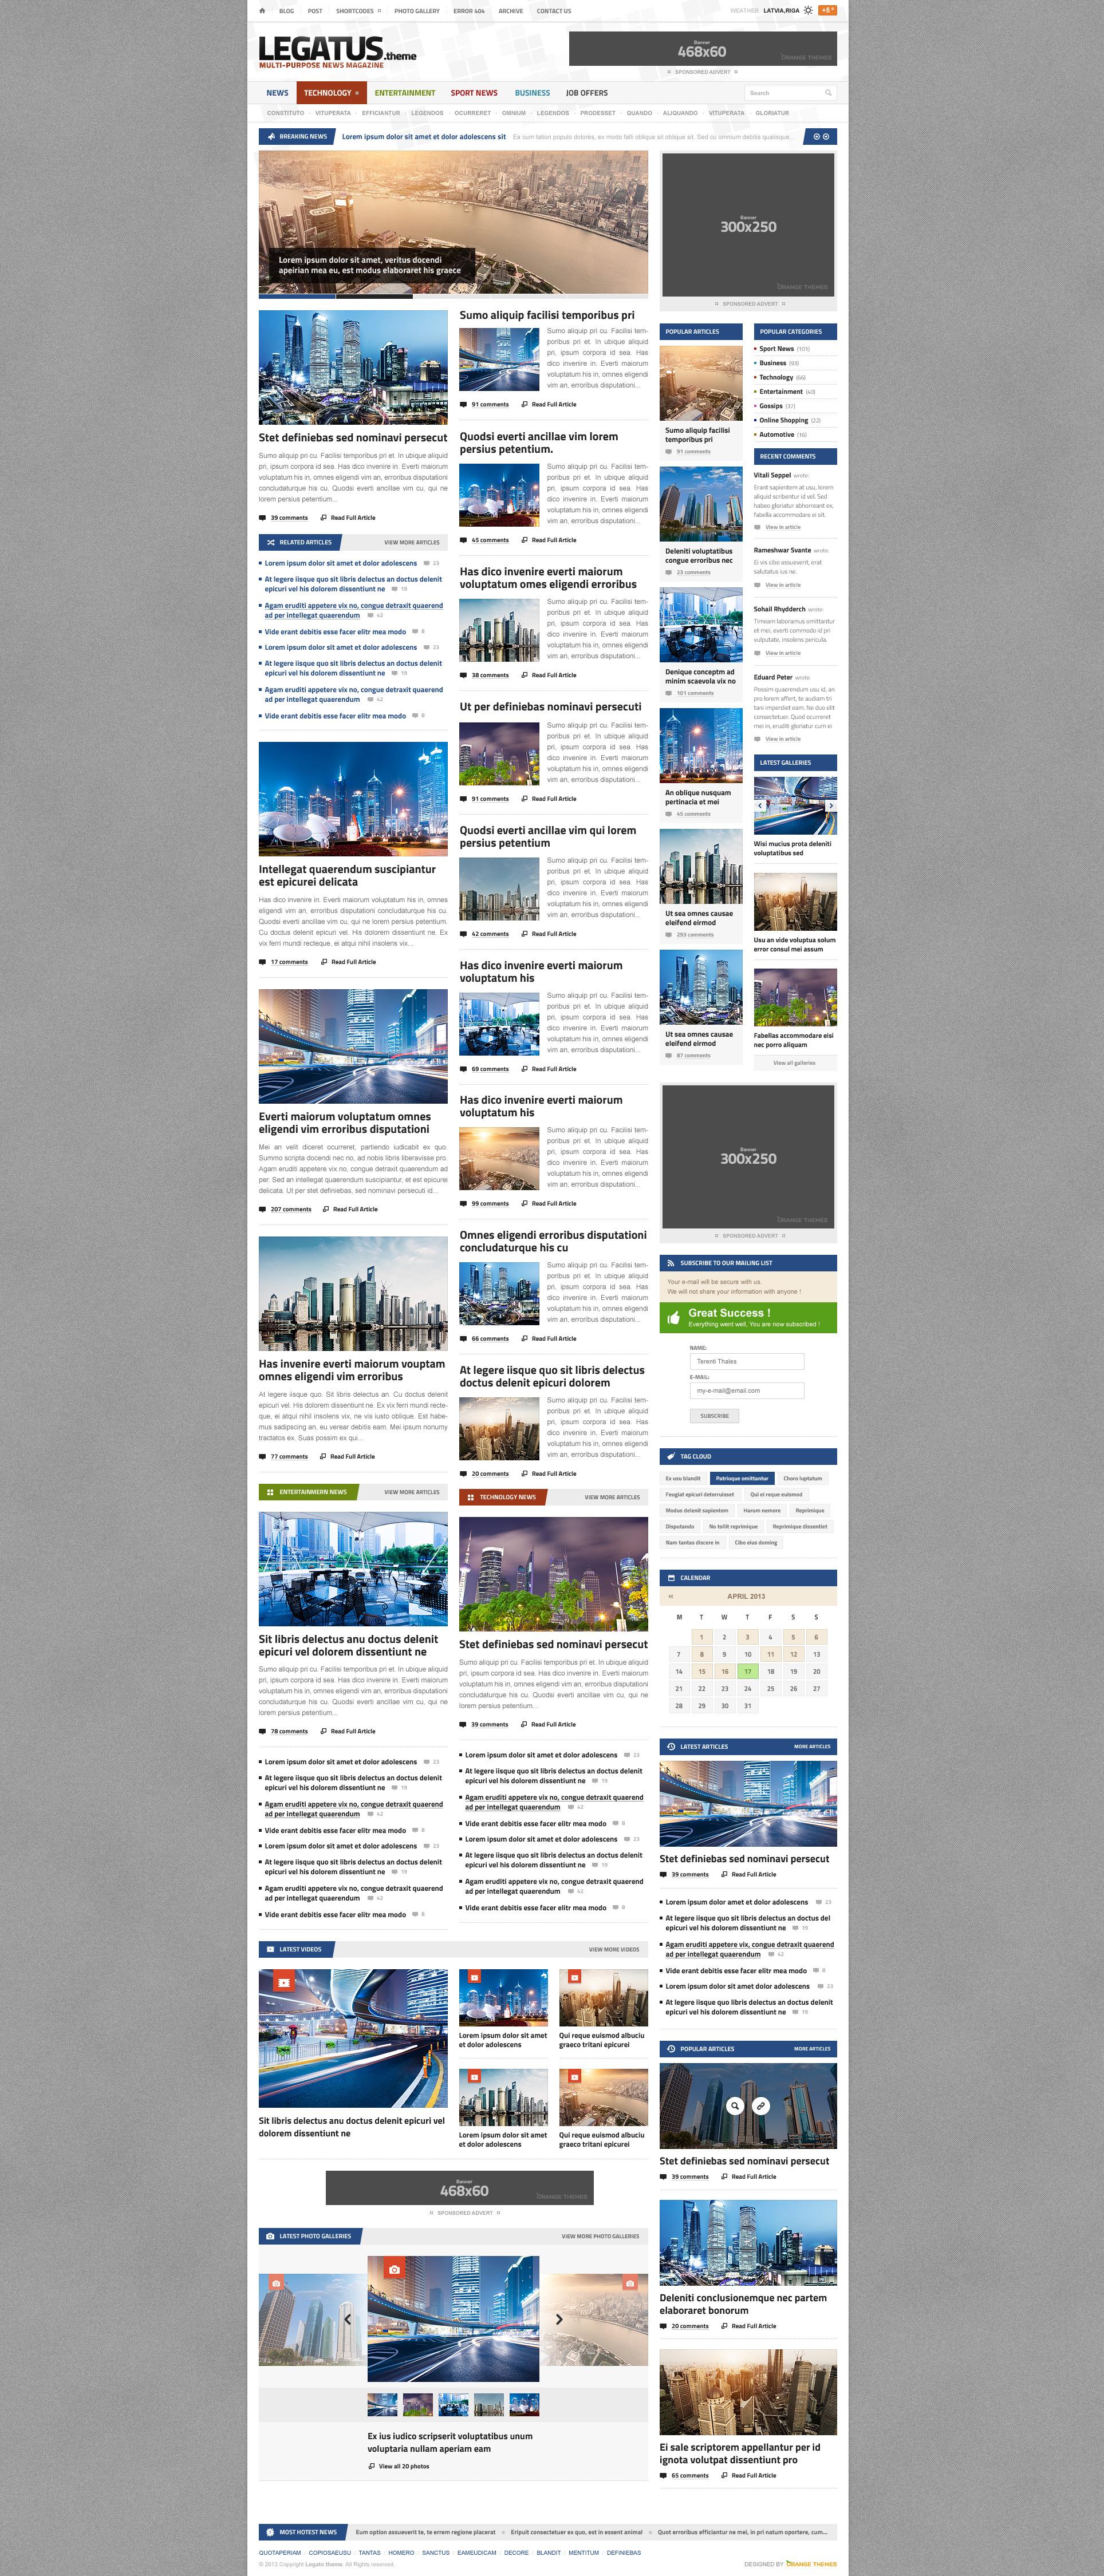 Legatus - Responsive News/Magazine Template - Magazine|Review